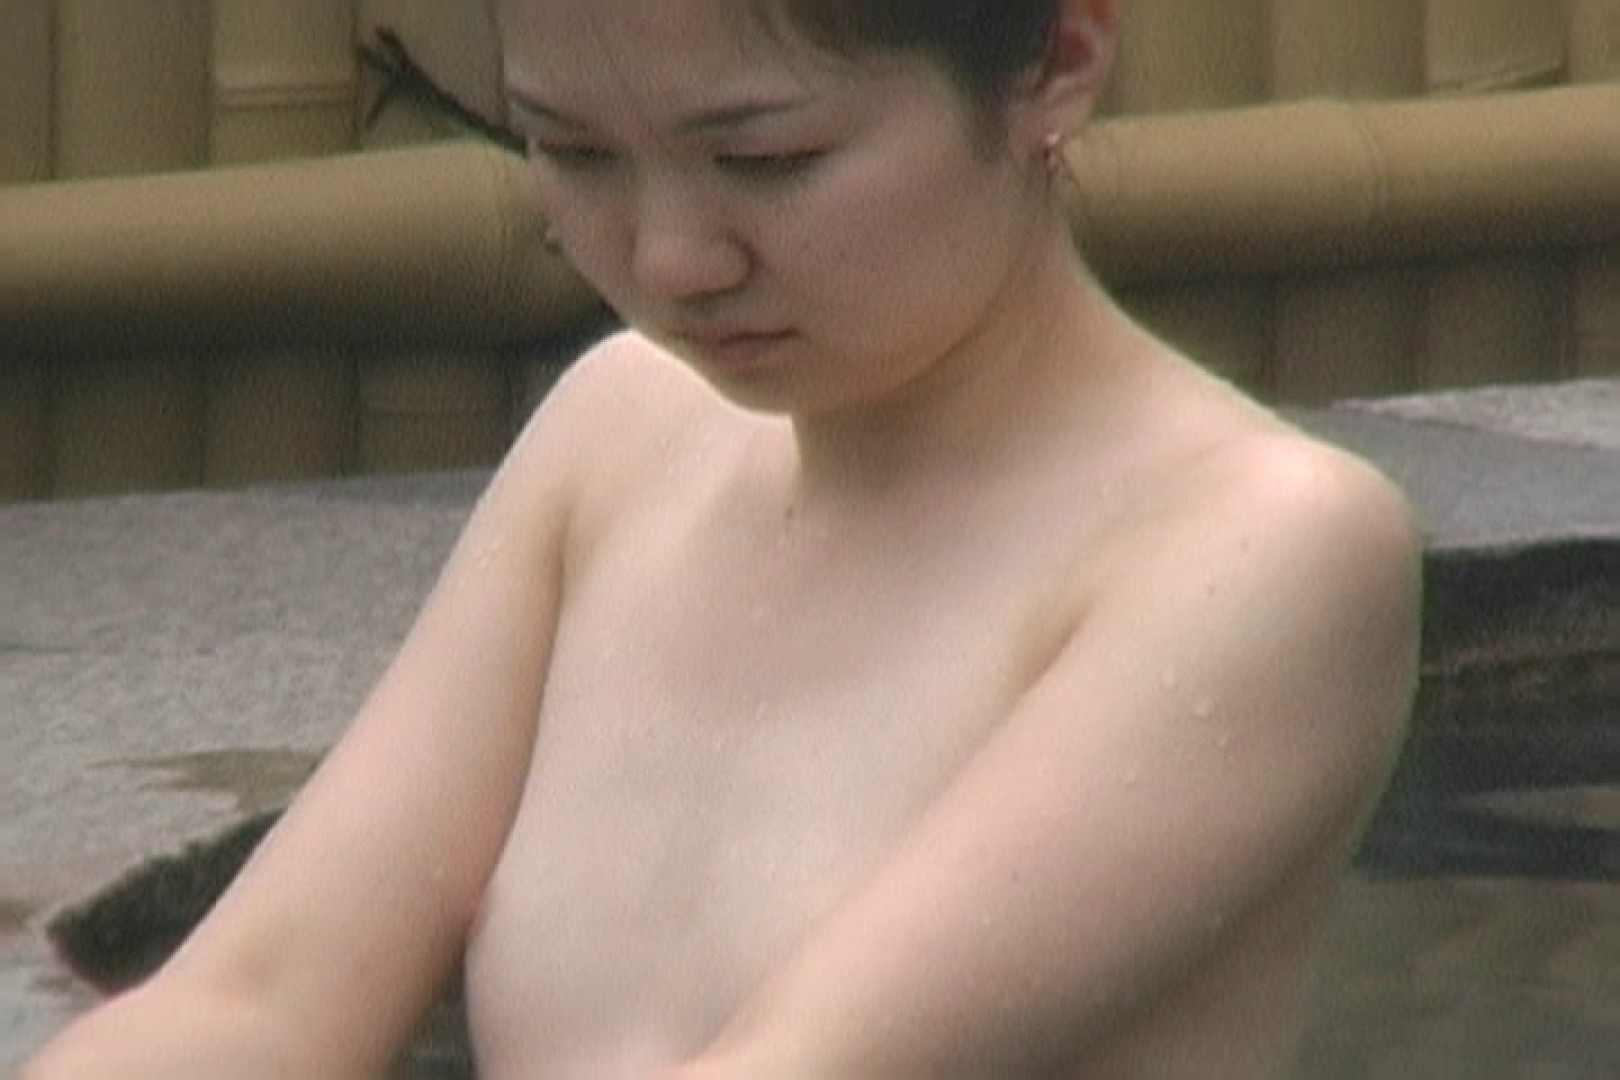 Aquaな露天風呂Vol.641 盗撮師作品 | 露天風呂突入  97pic 40